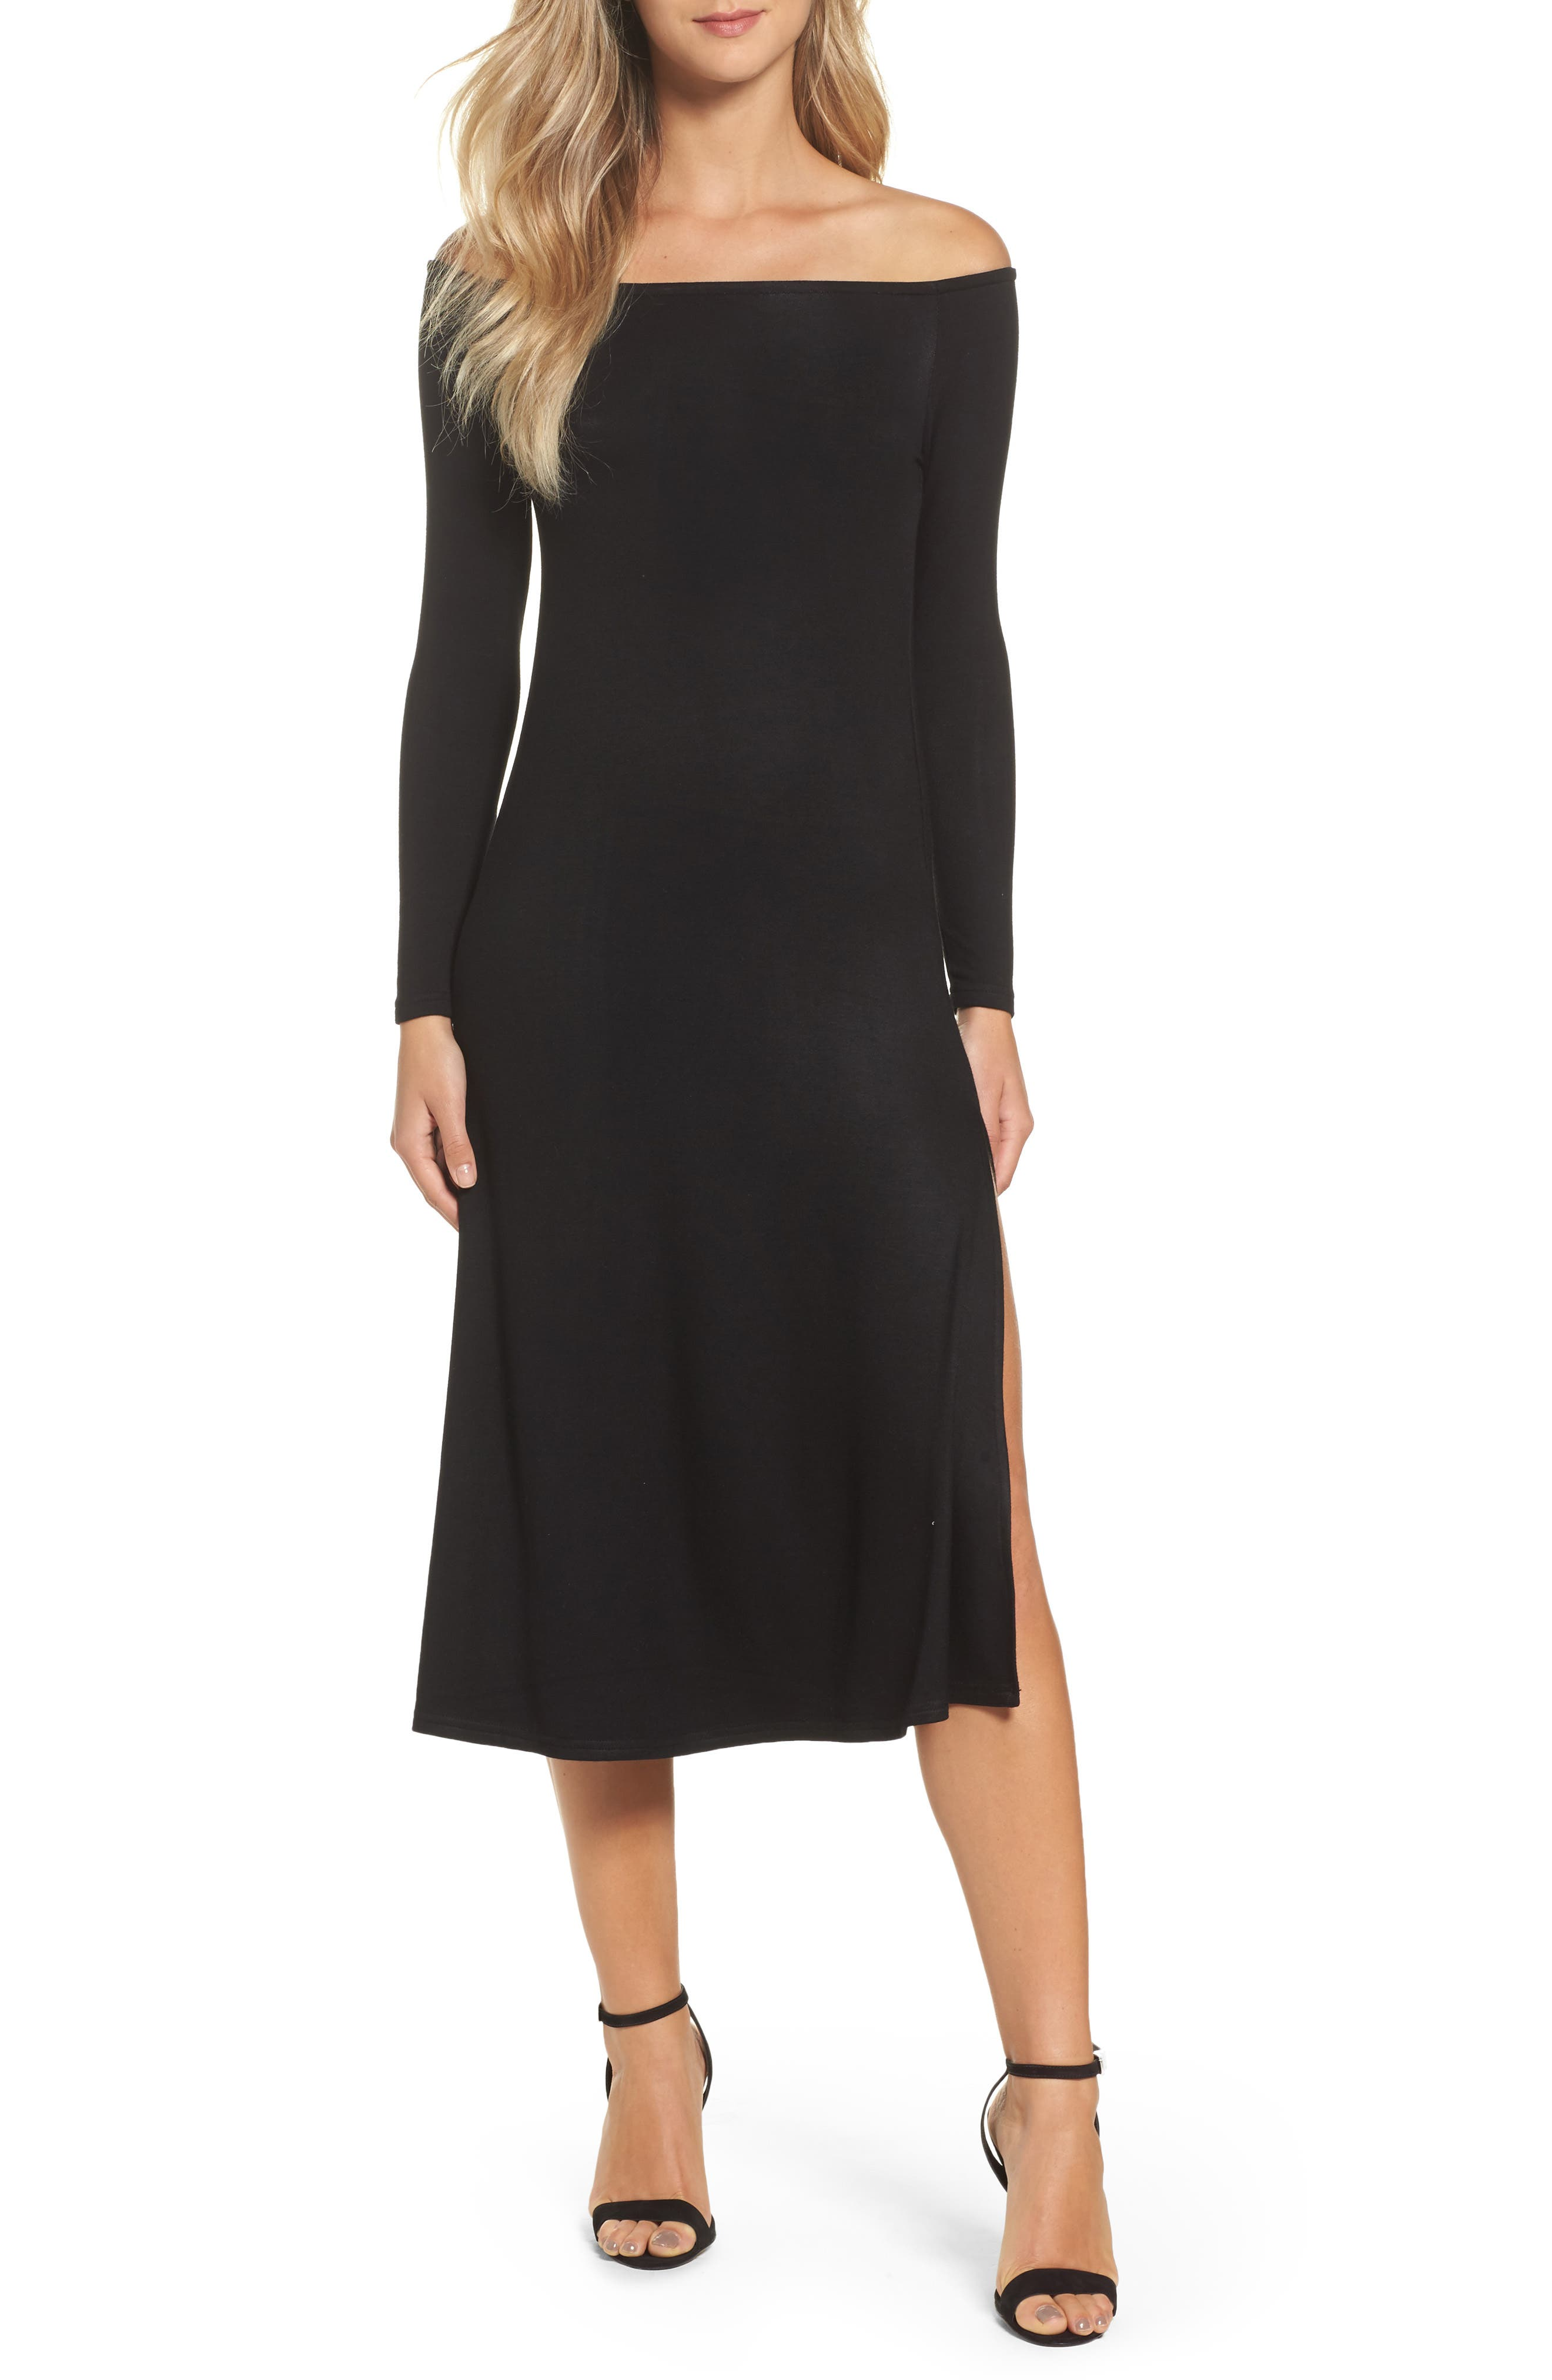 Blair Off the Shoulder A-Line Dress,                         Main,                         color, 001